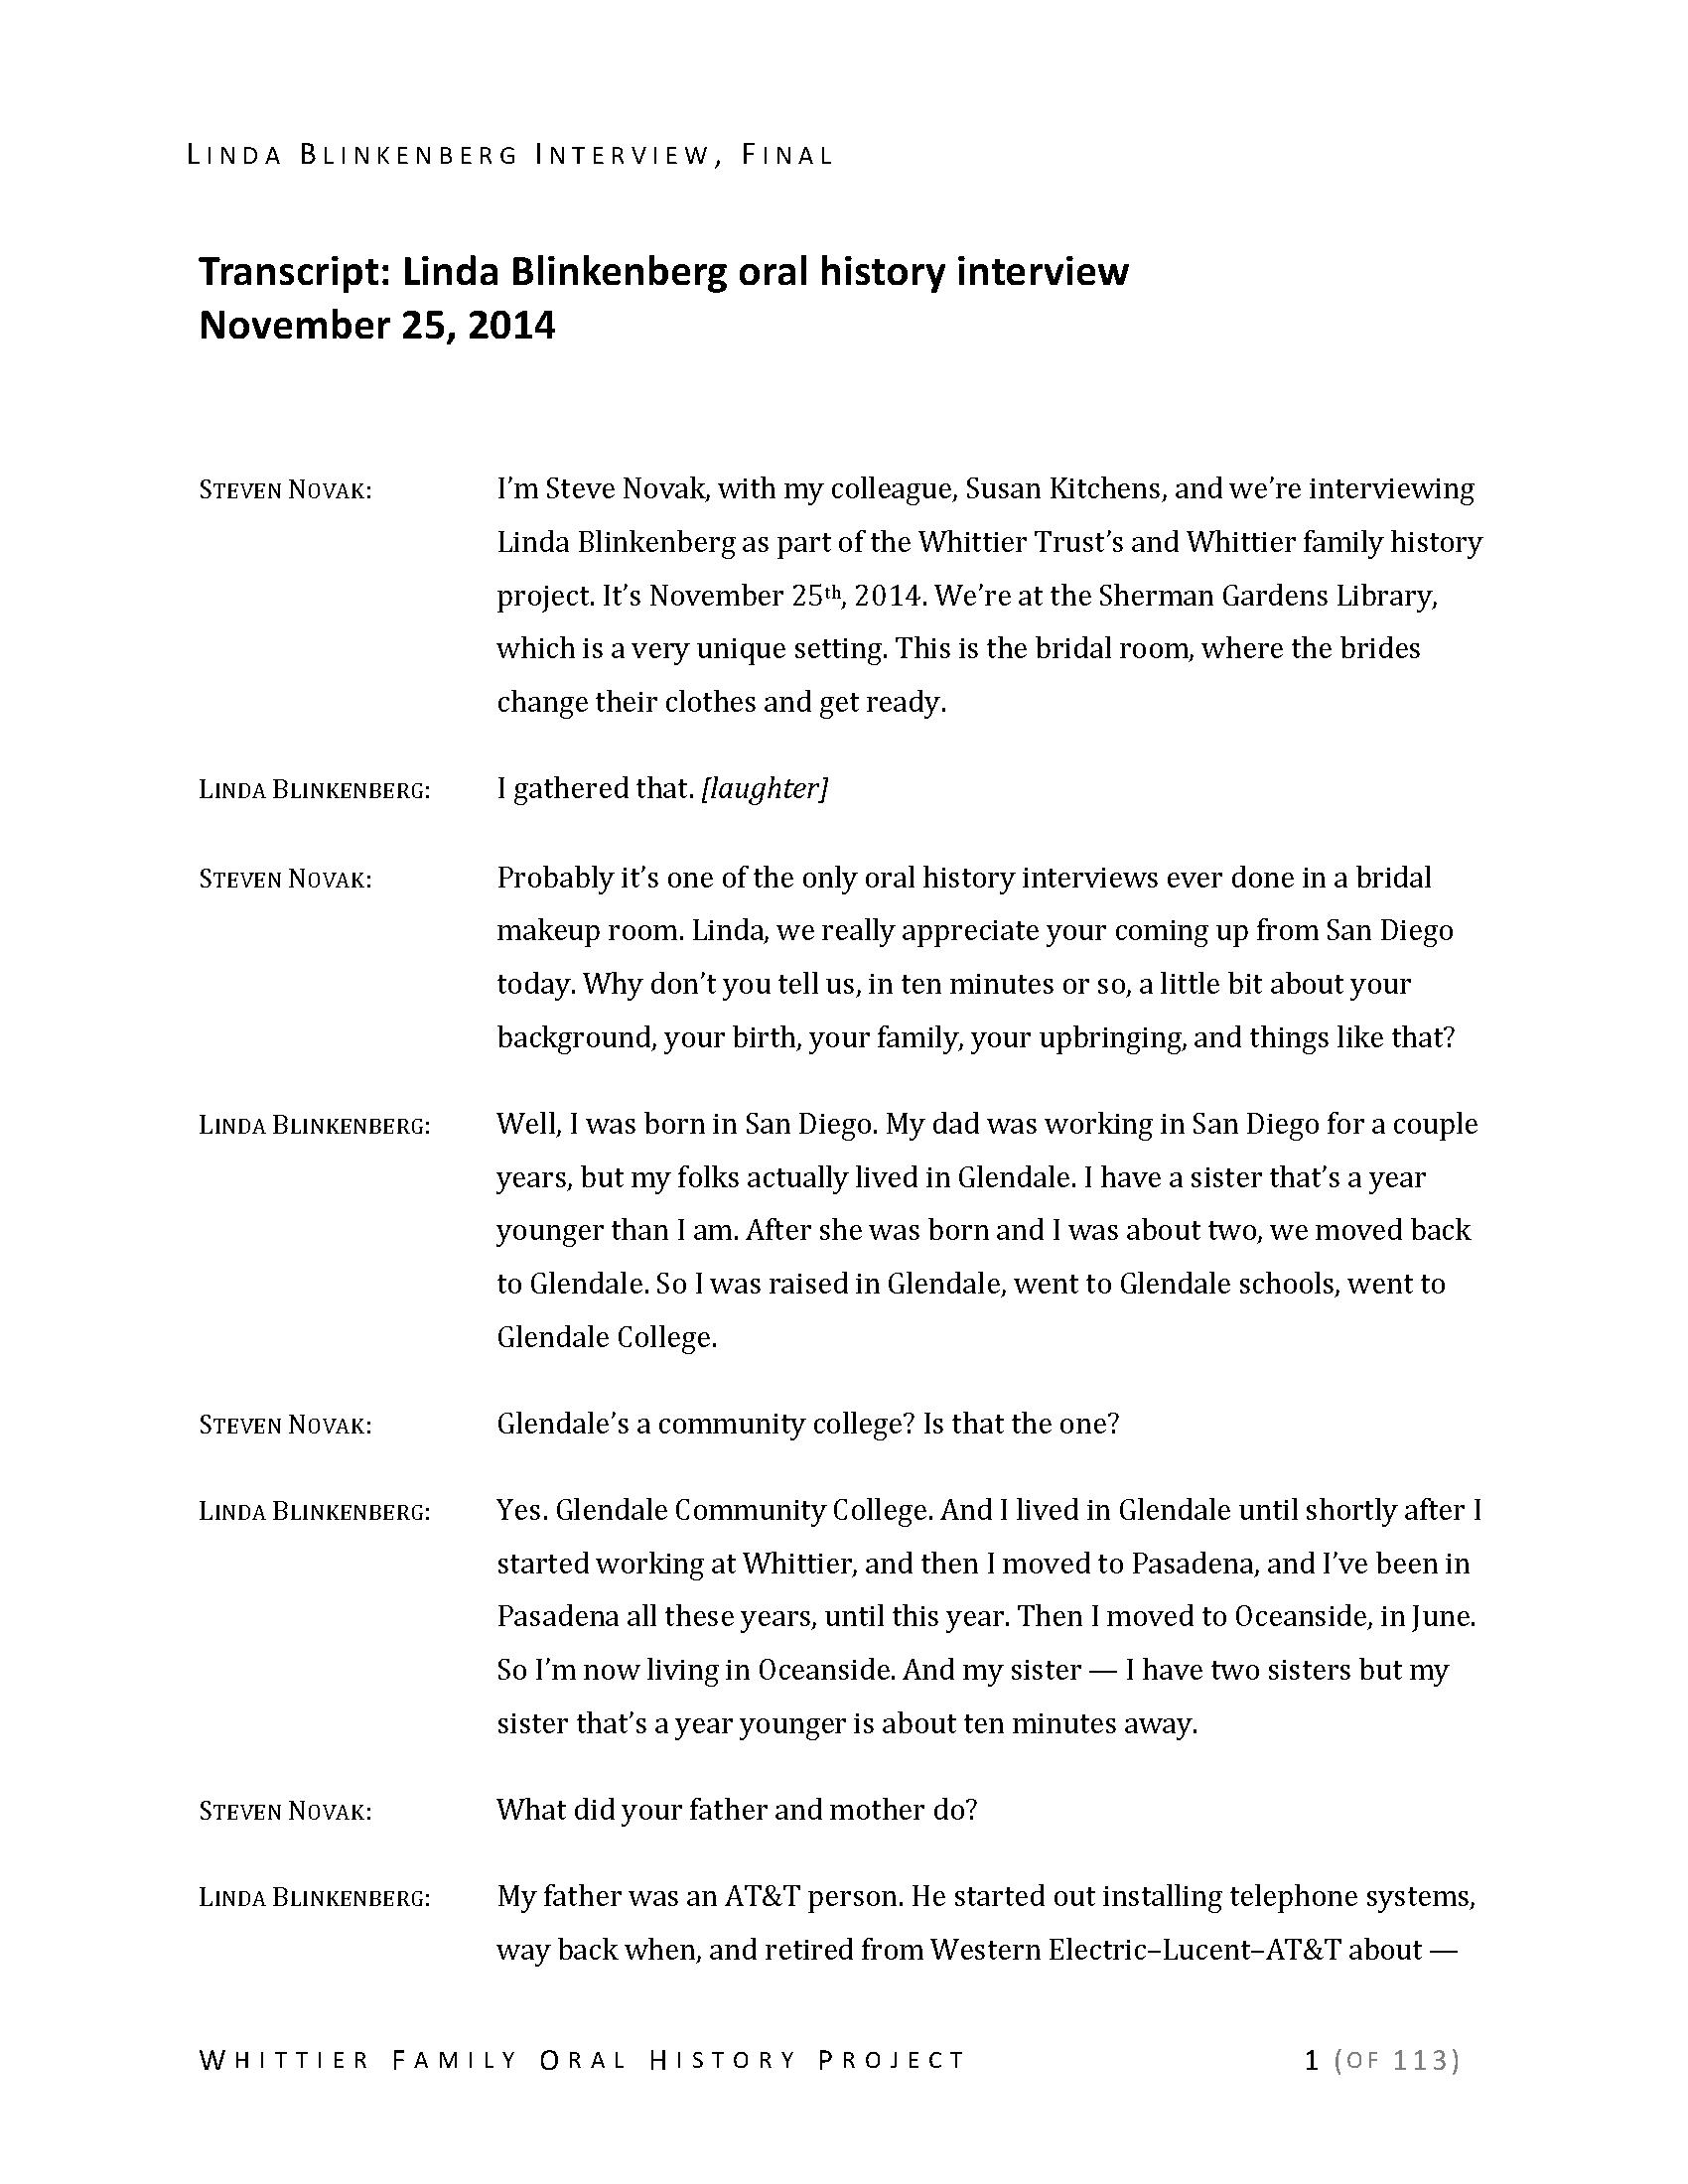 Linda Blinkenberg oral history interview  - Manuscripts - Huntington